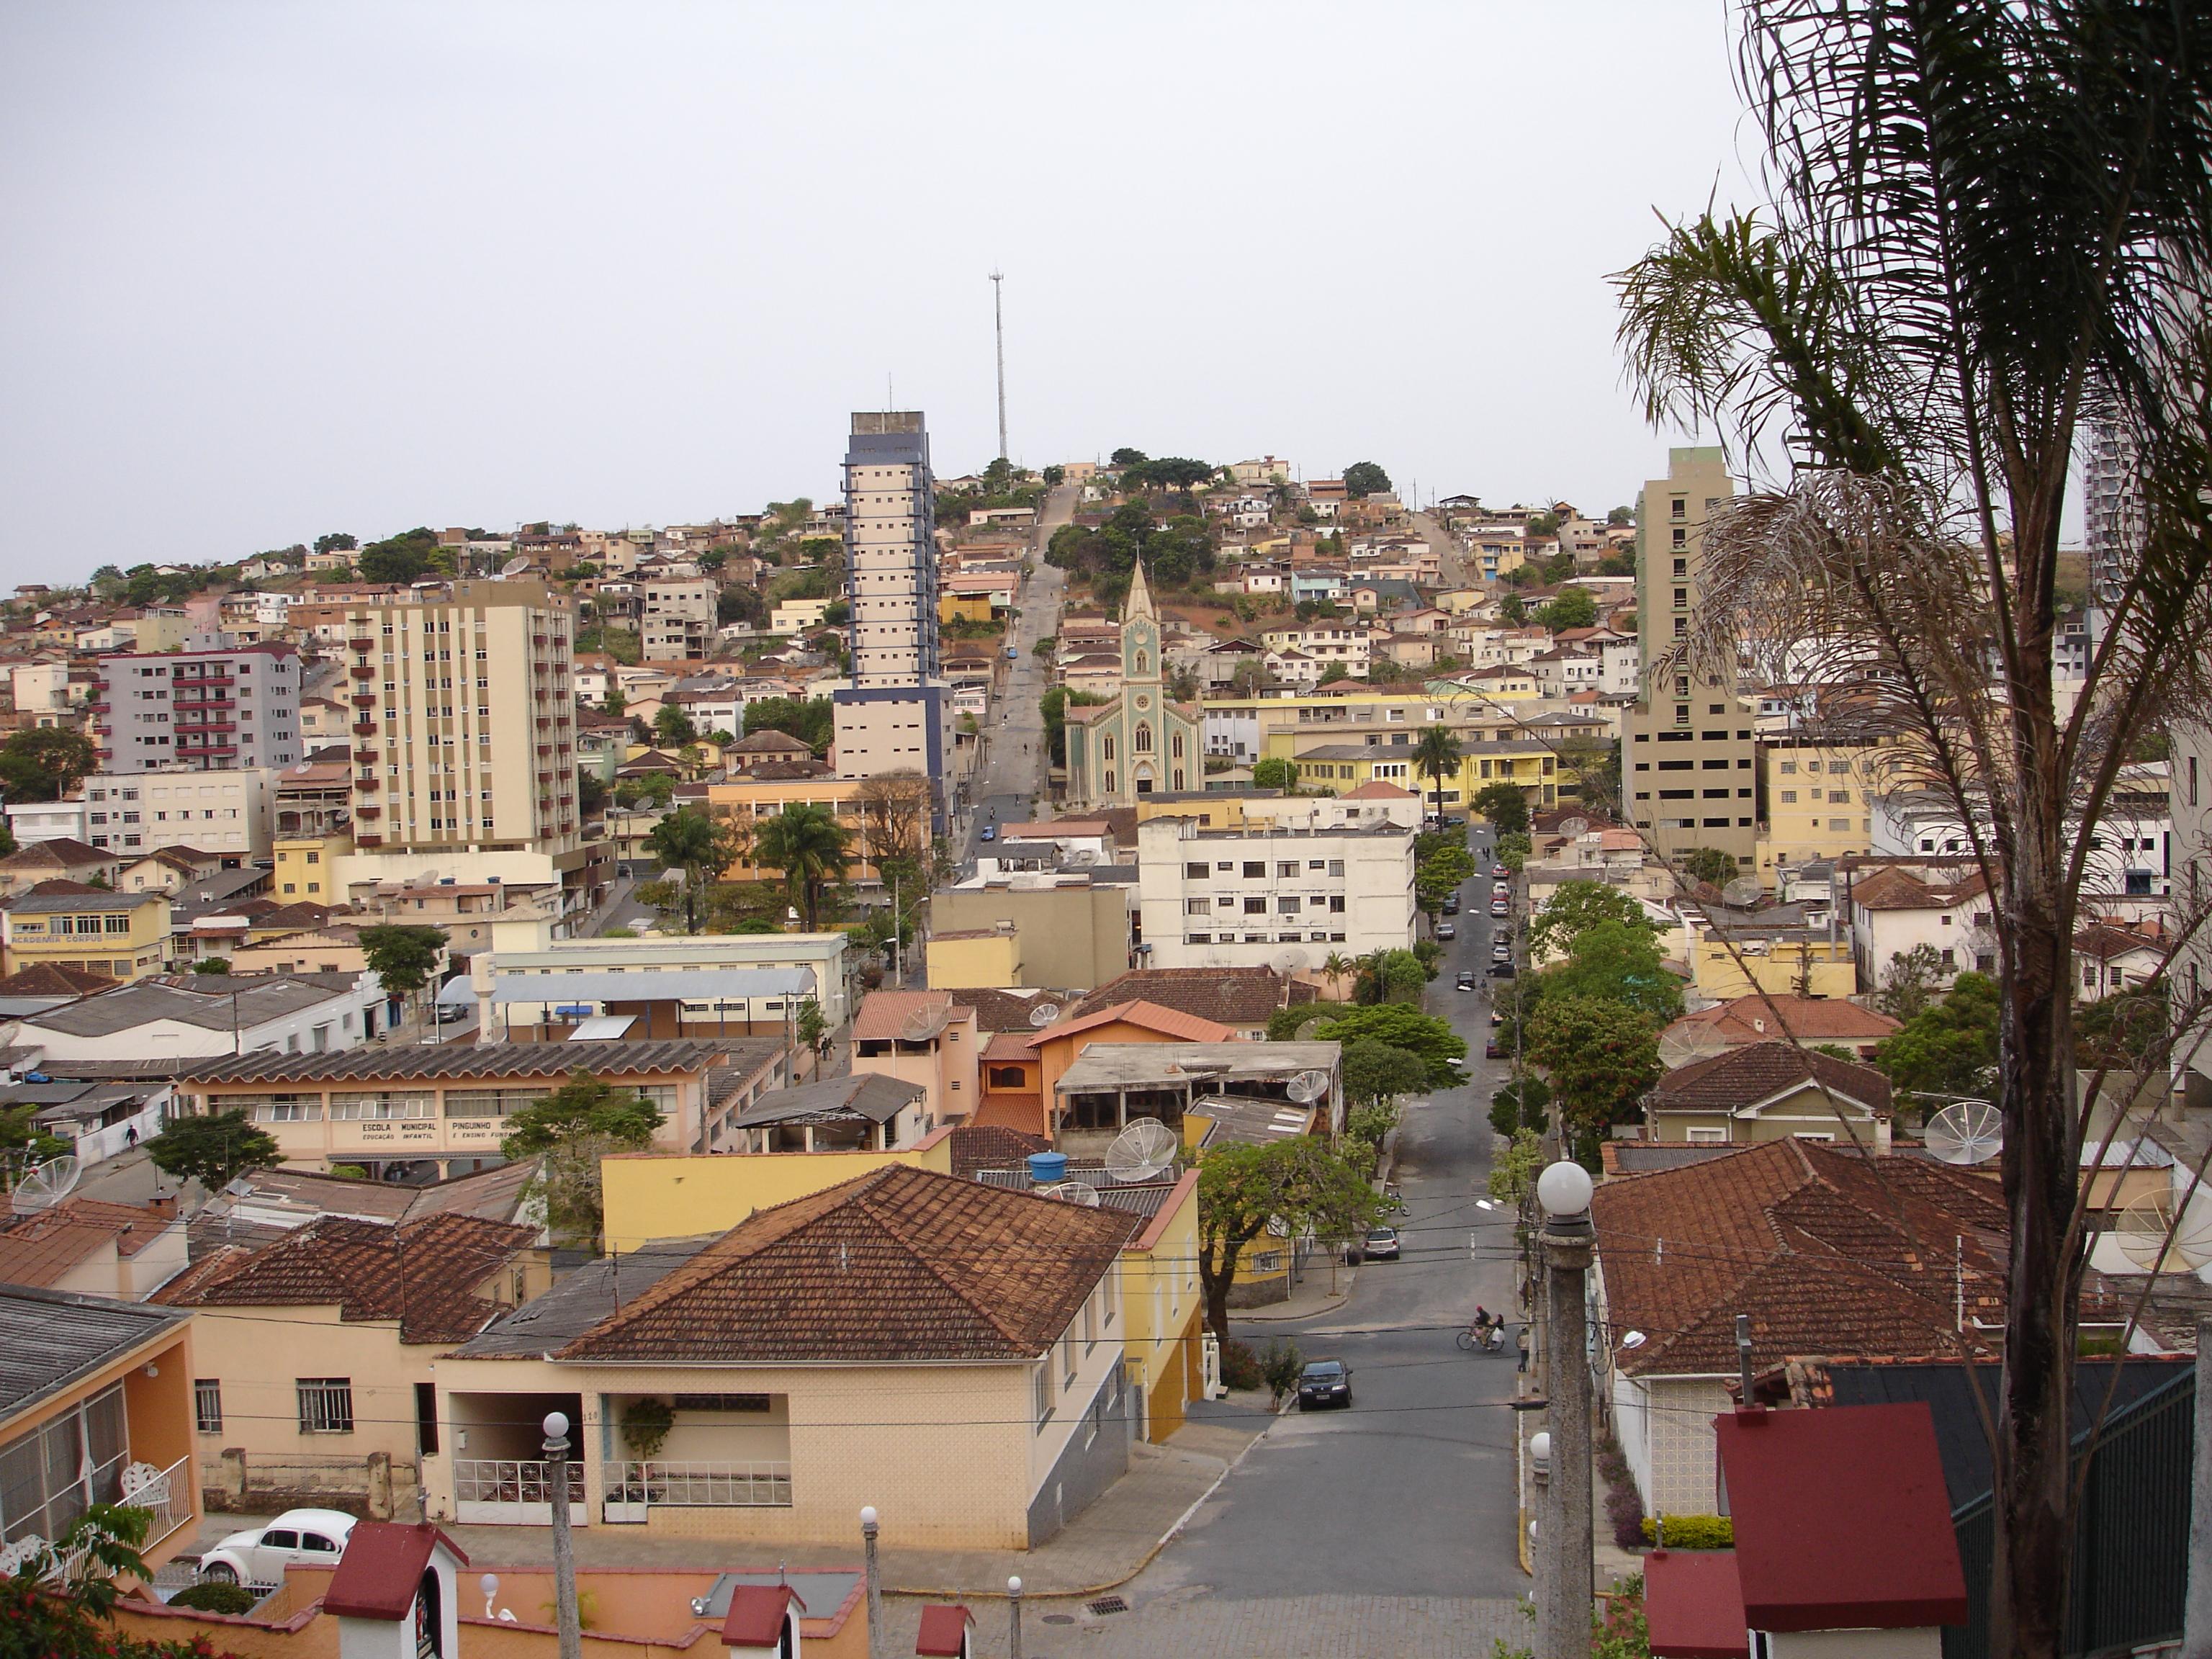 Caxambu Minas Gerais fonte: upload.wikimedia.org